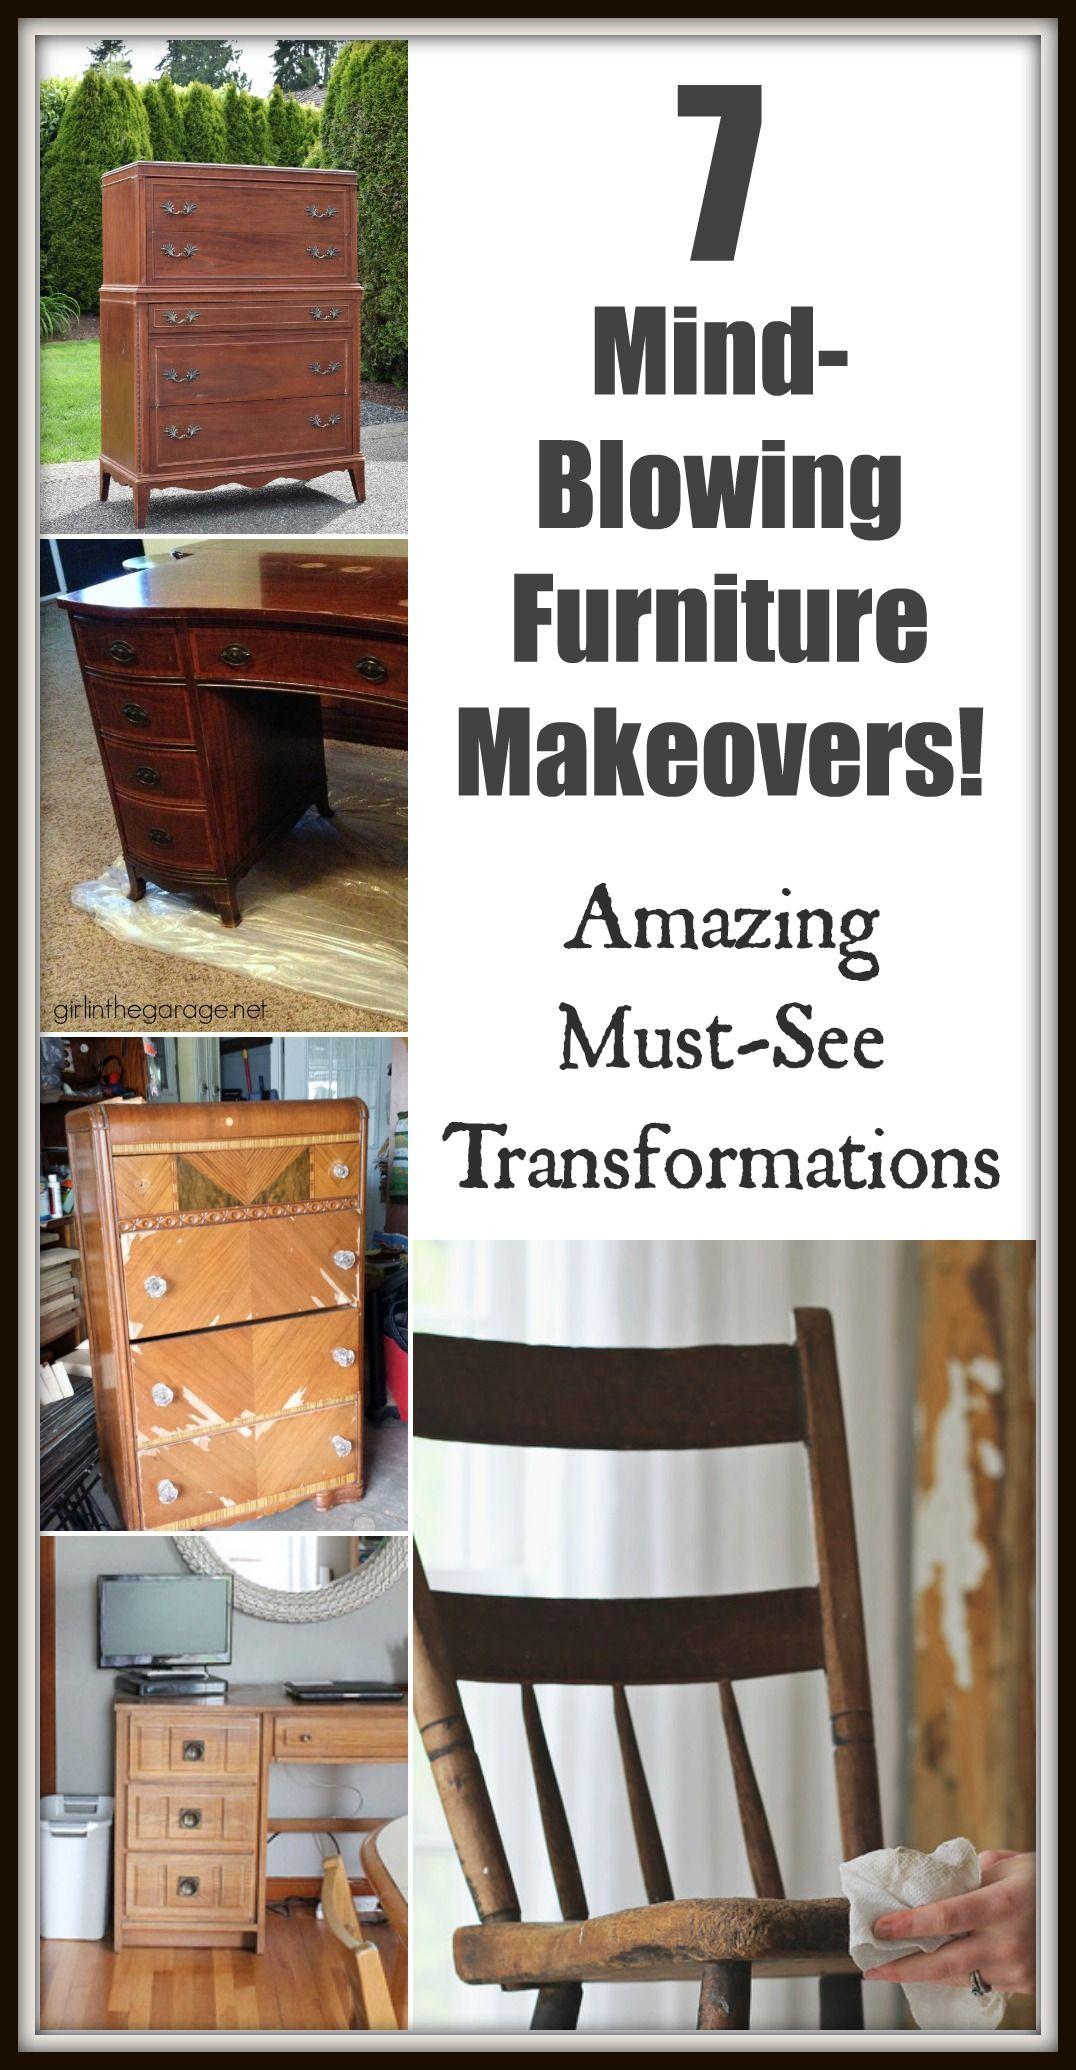 diy furniture makeovers. Amazing Furniture Makeovers Diy